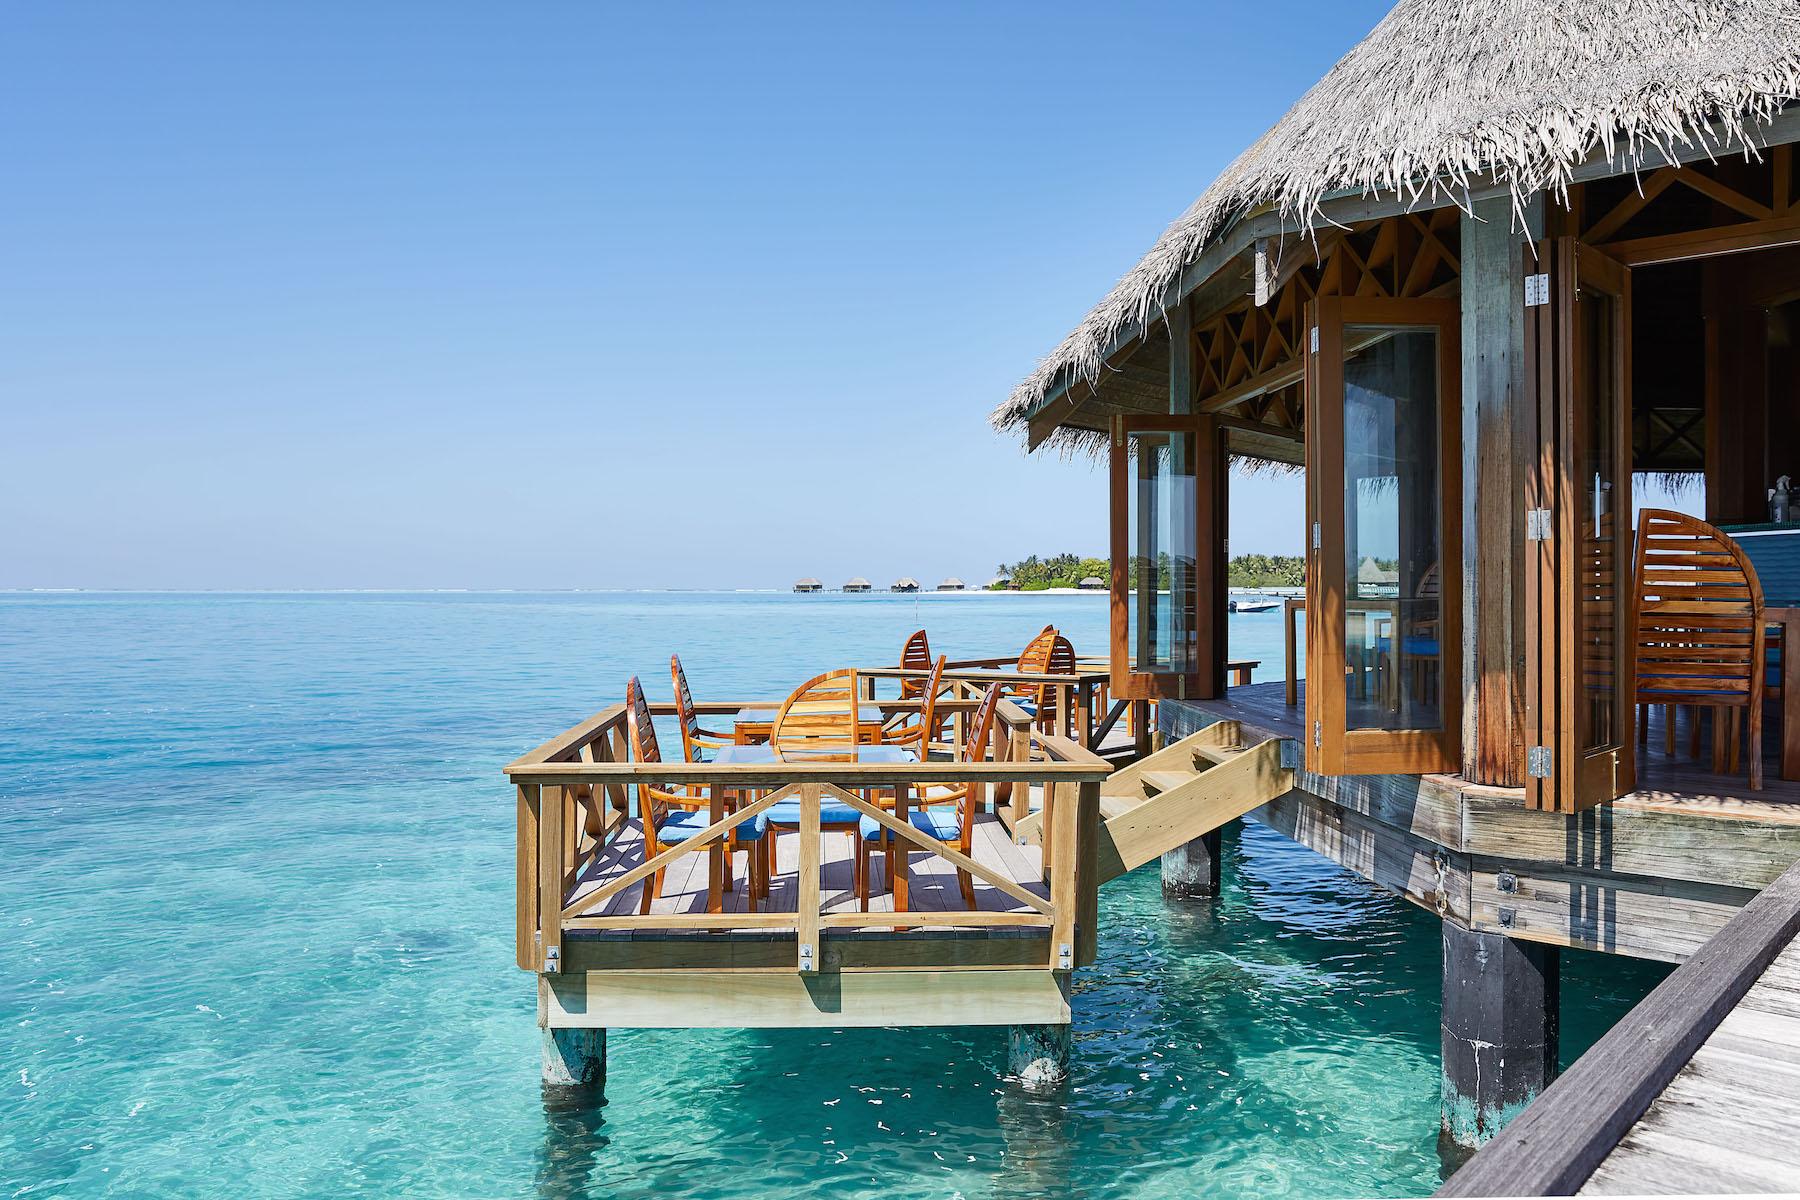 CONRAD MALDIVES_Sunset Grill_Day_credit Justin Nicholas- hi-res (3).jpg